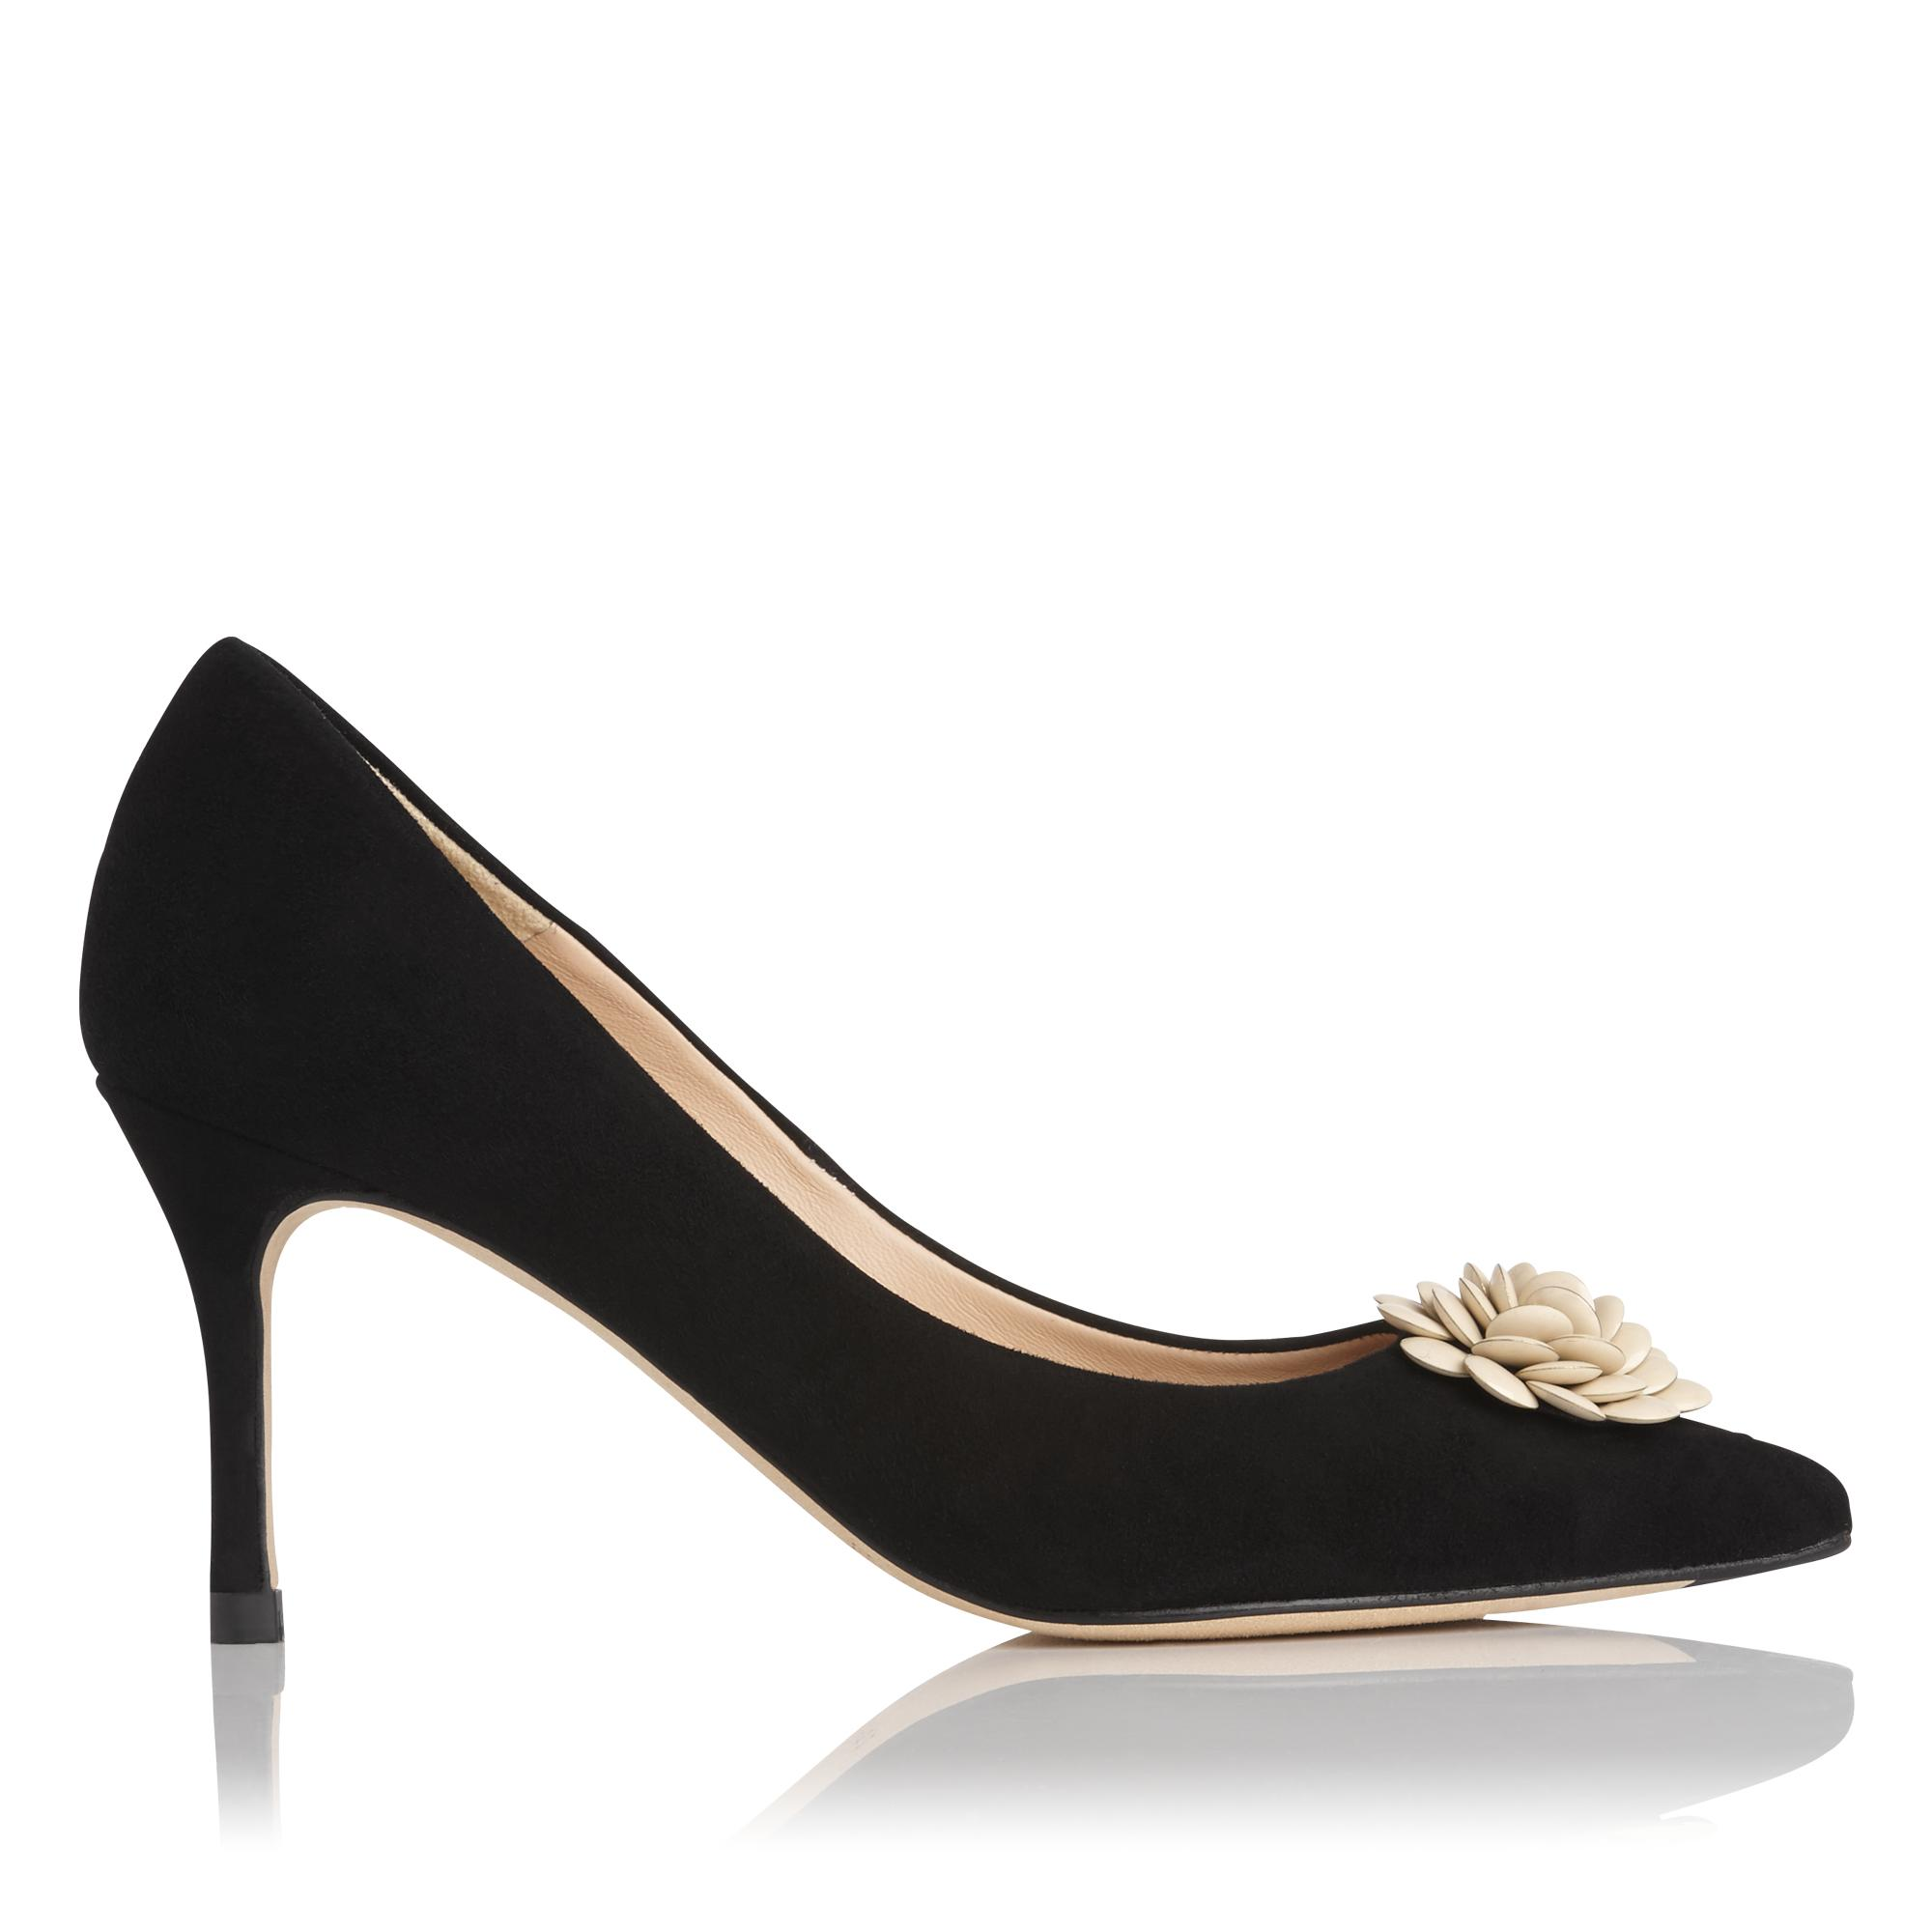 Gisele Black Suede Heel